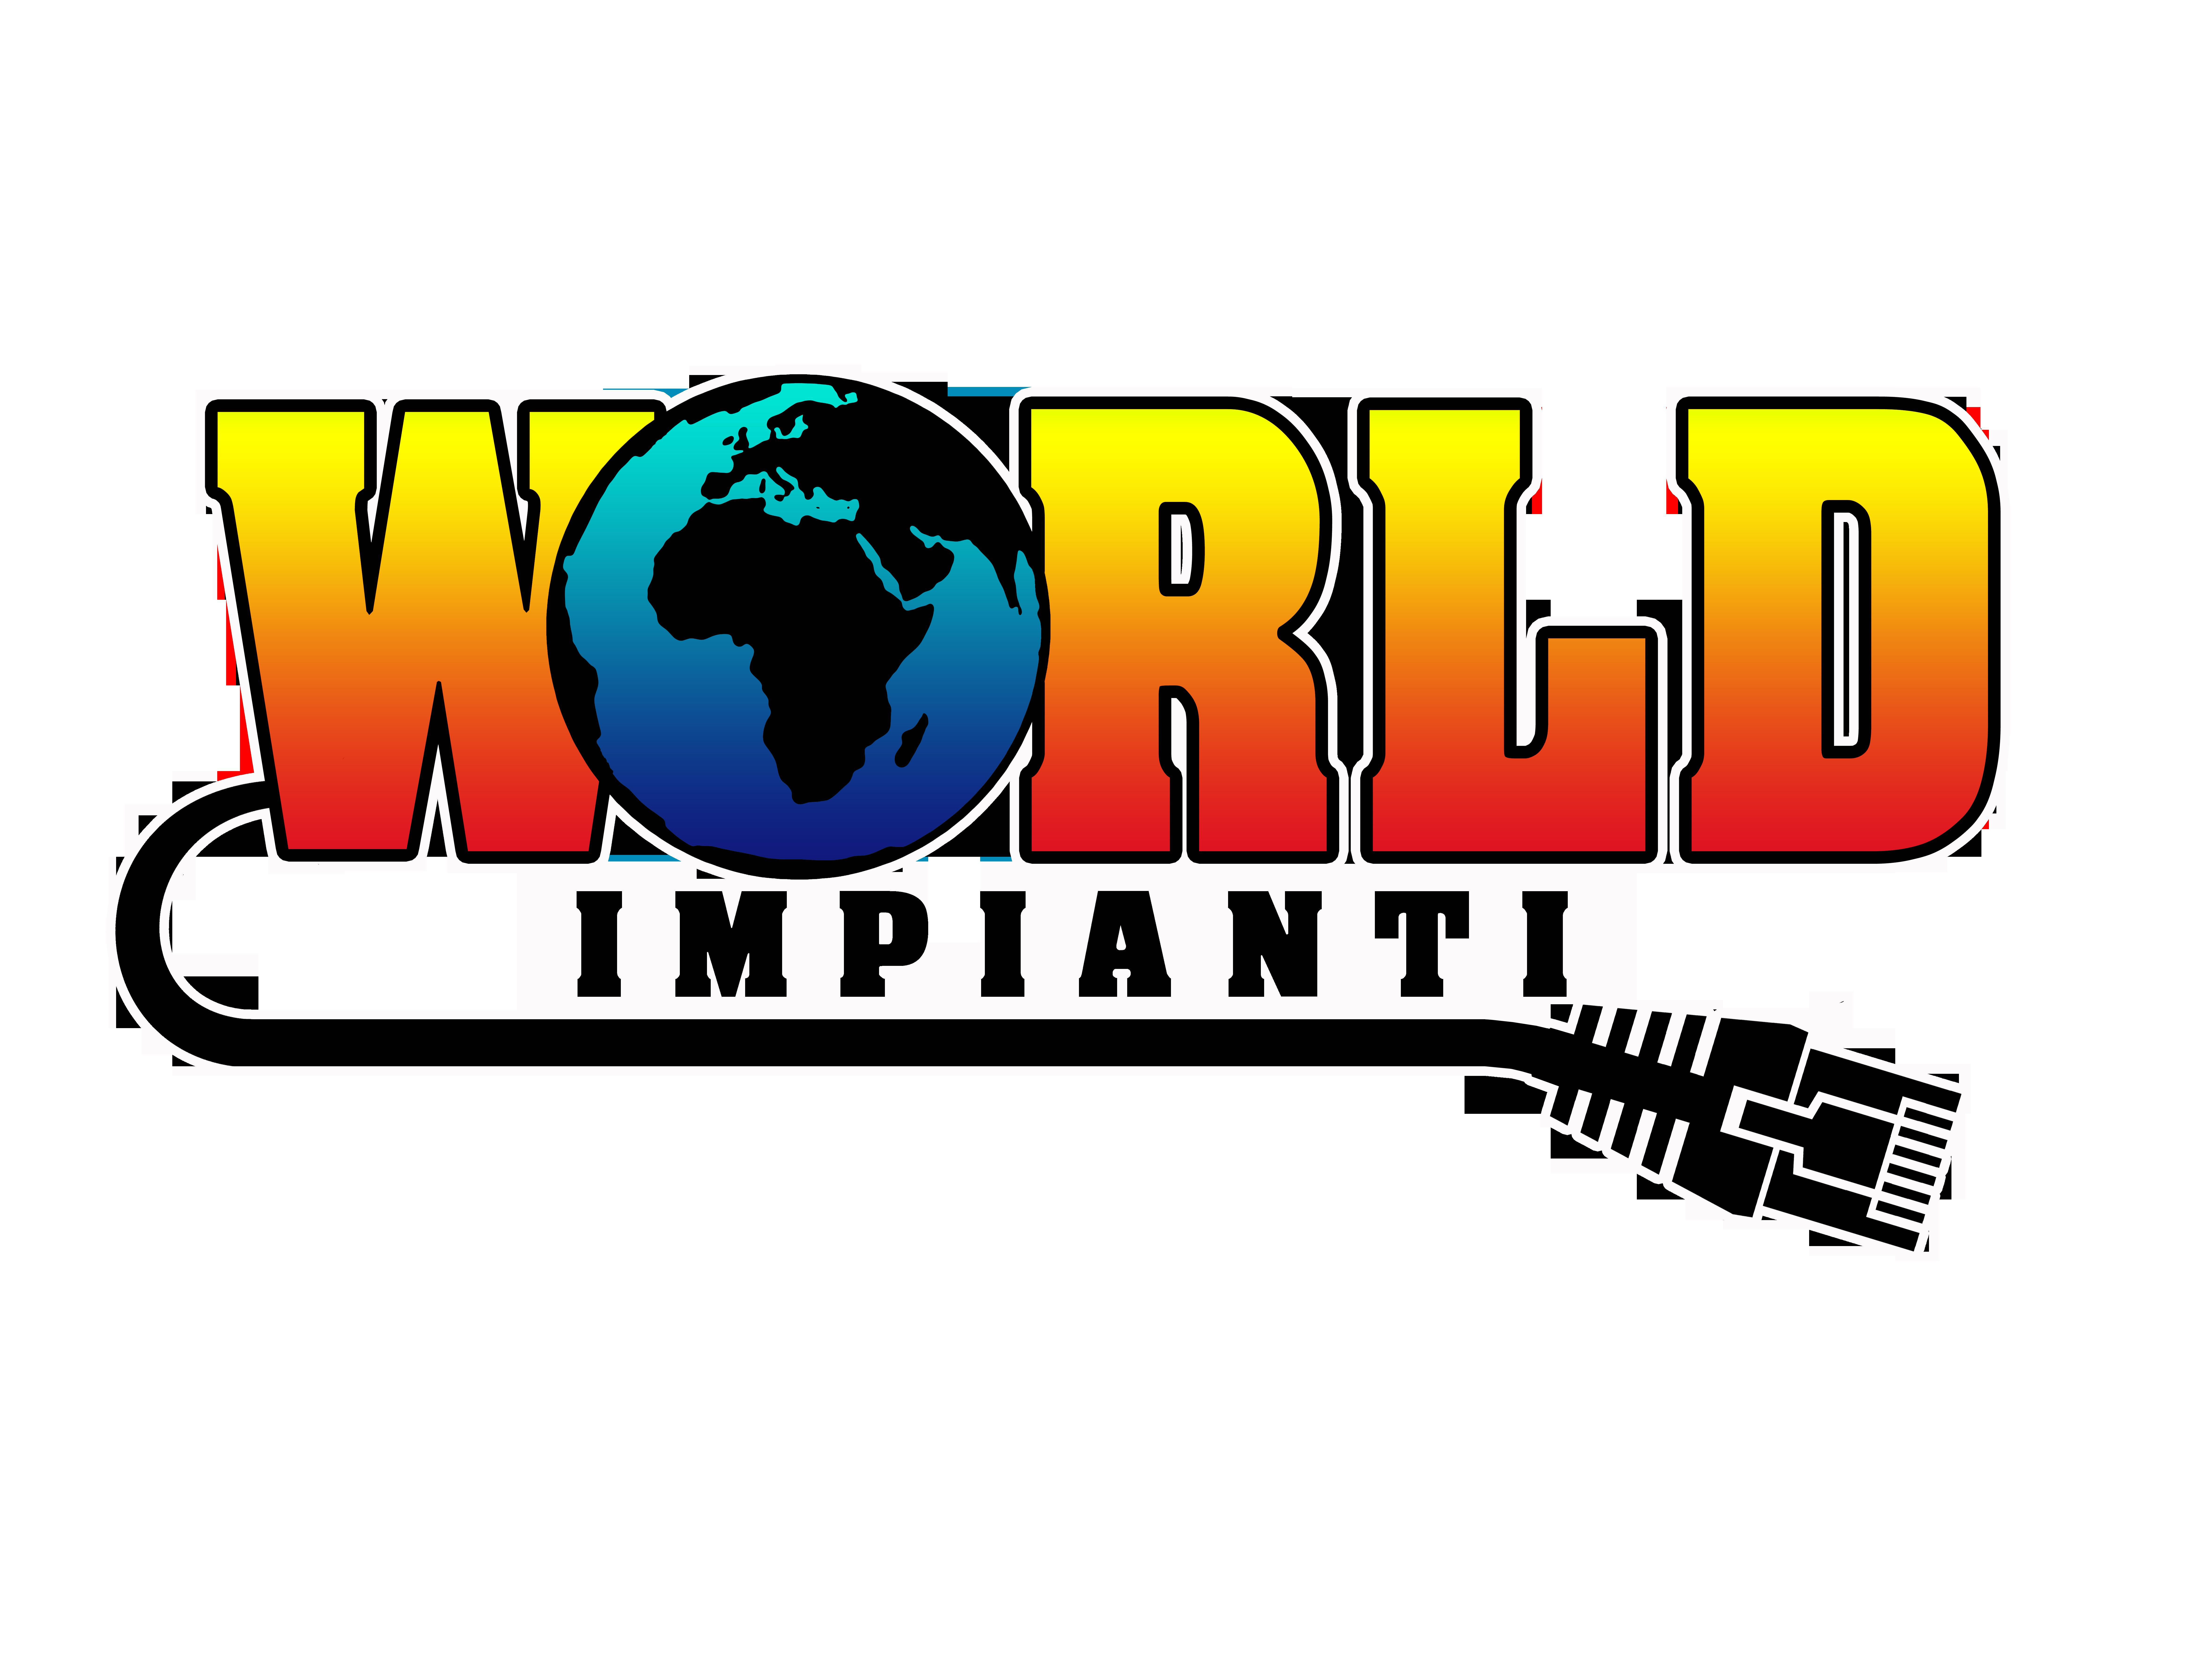 World Impianti snc